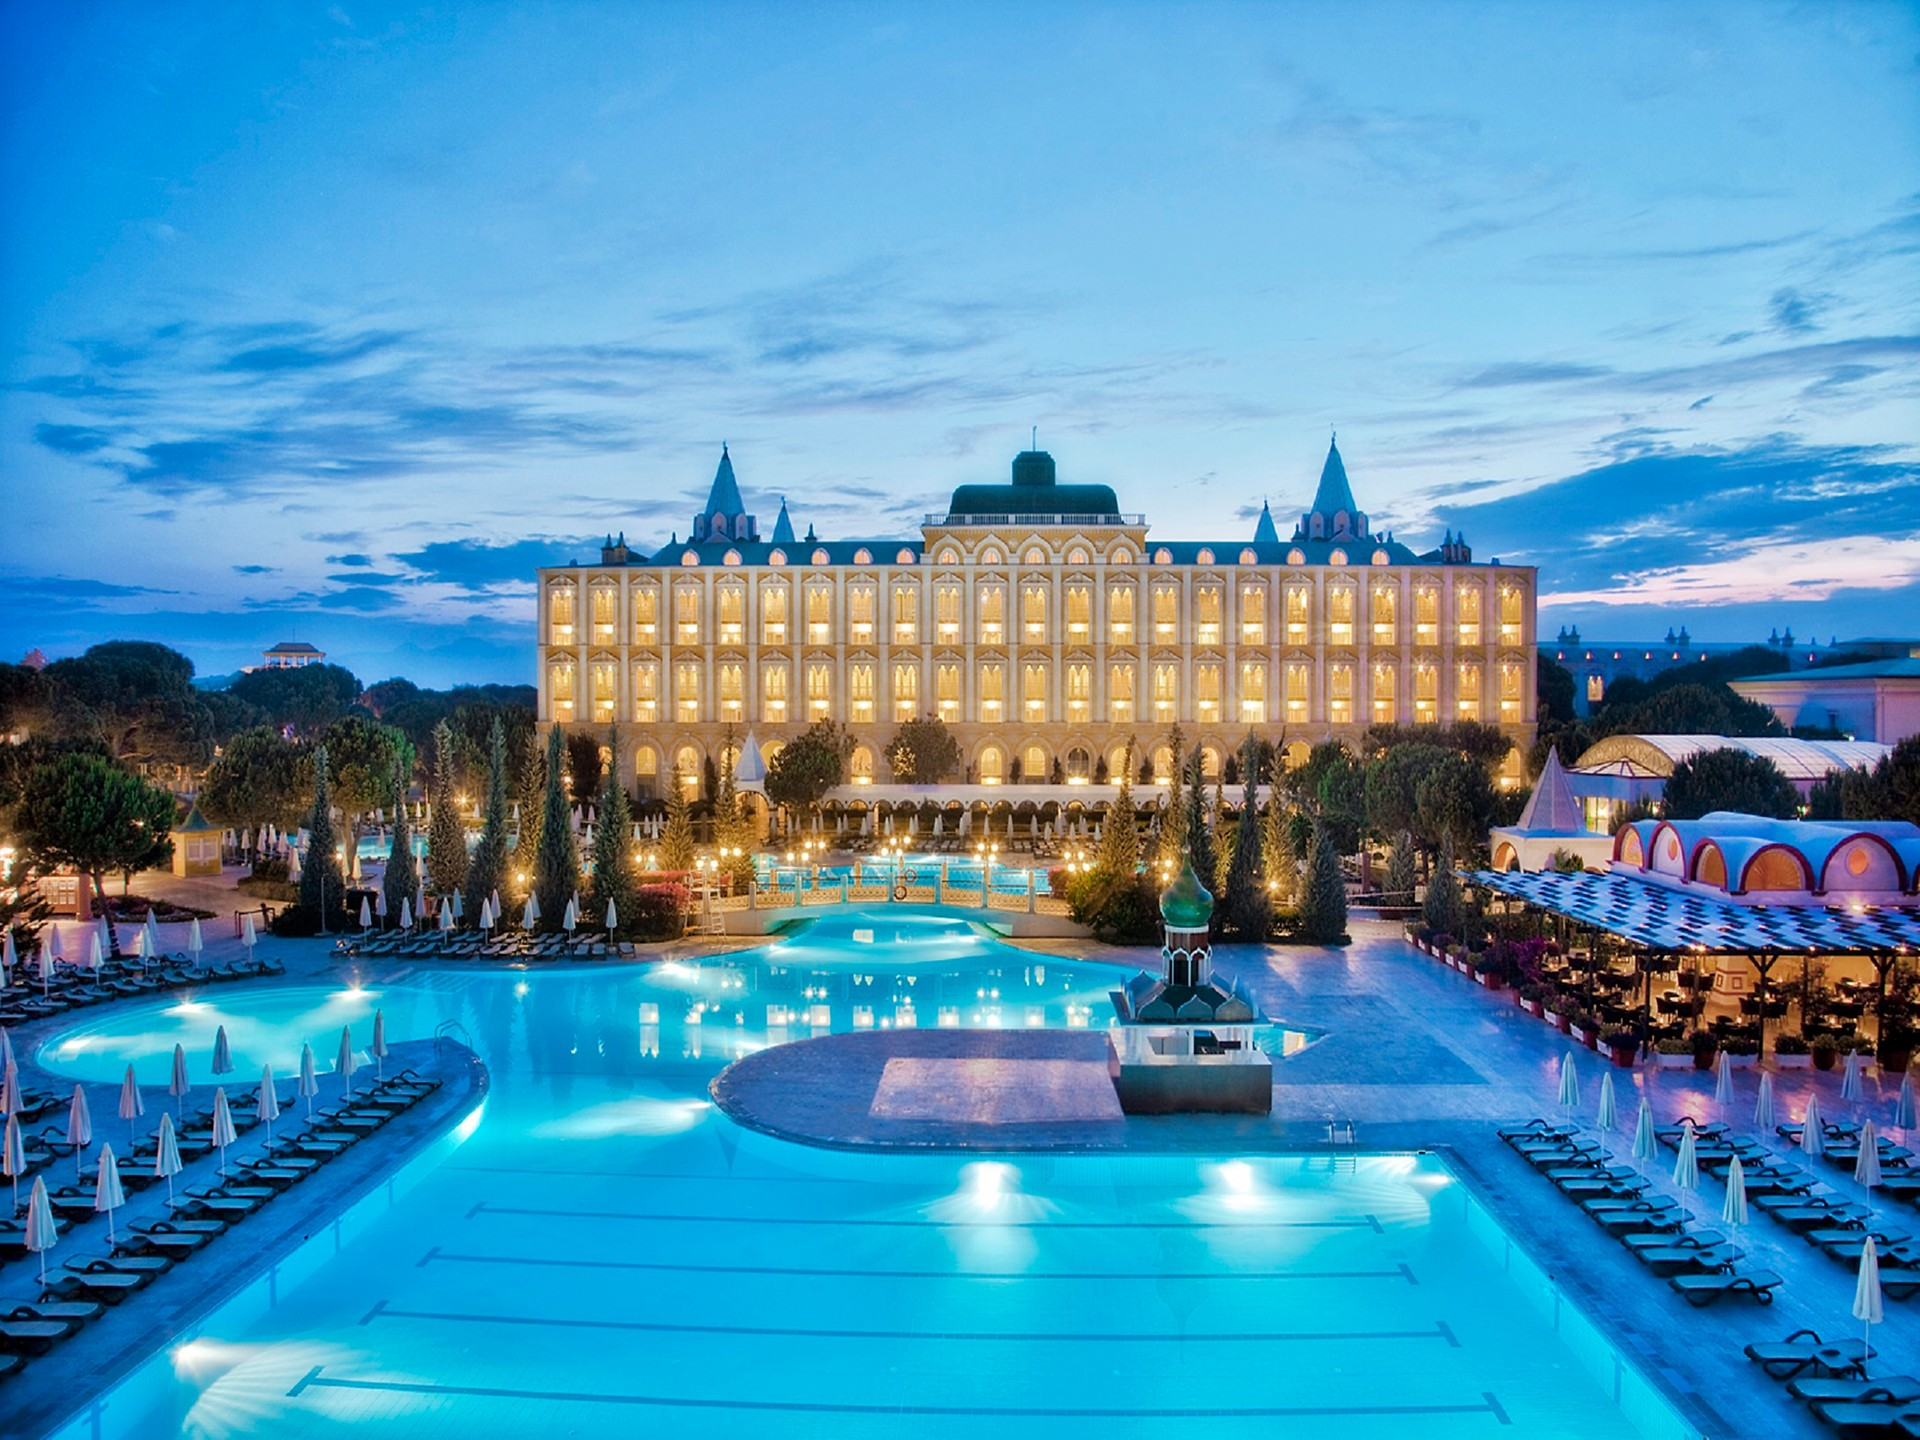 هتل استریا کرملین پالاس آنتالیا